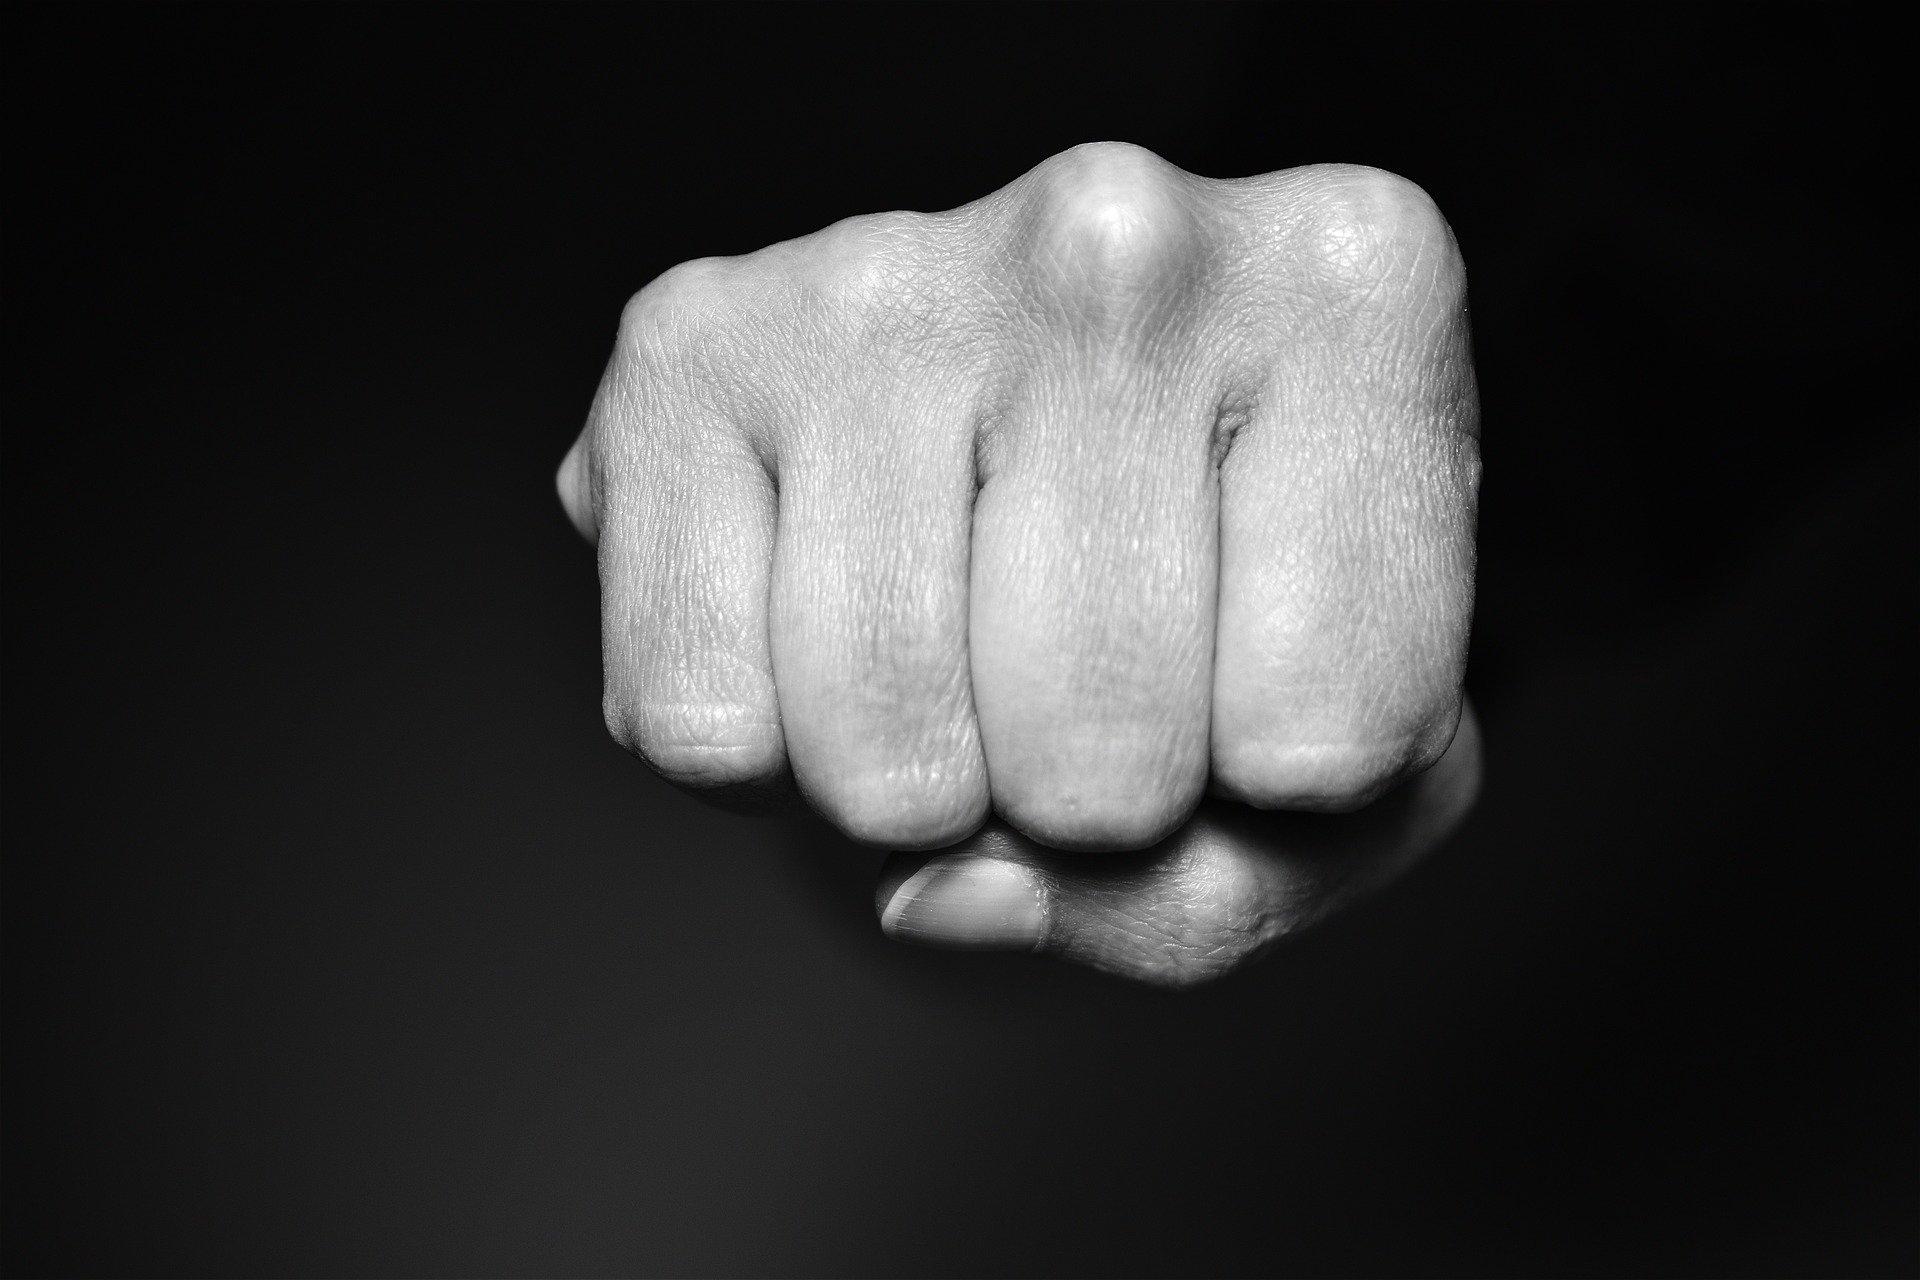 fist-4112964_1920